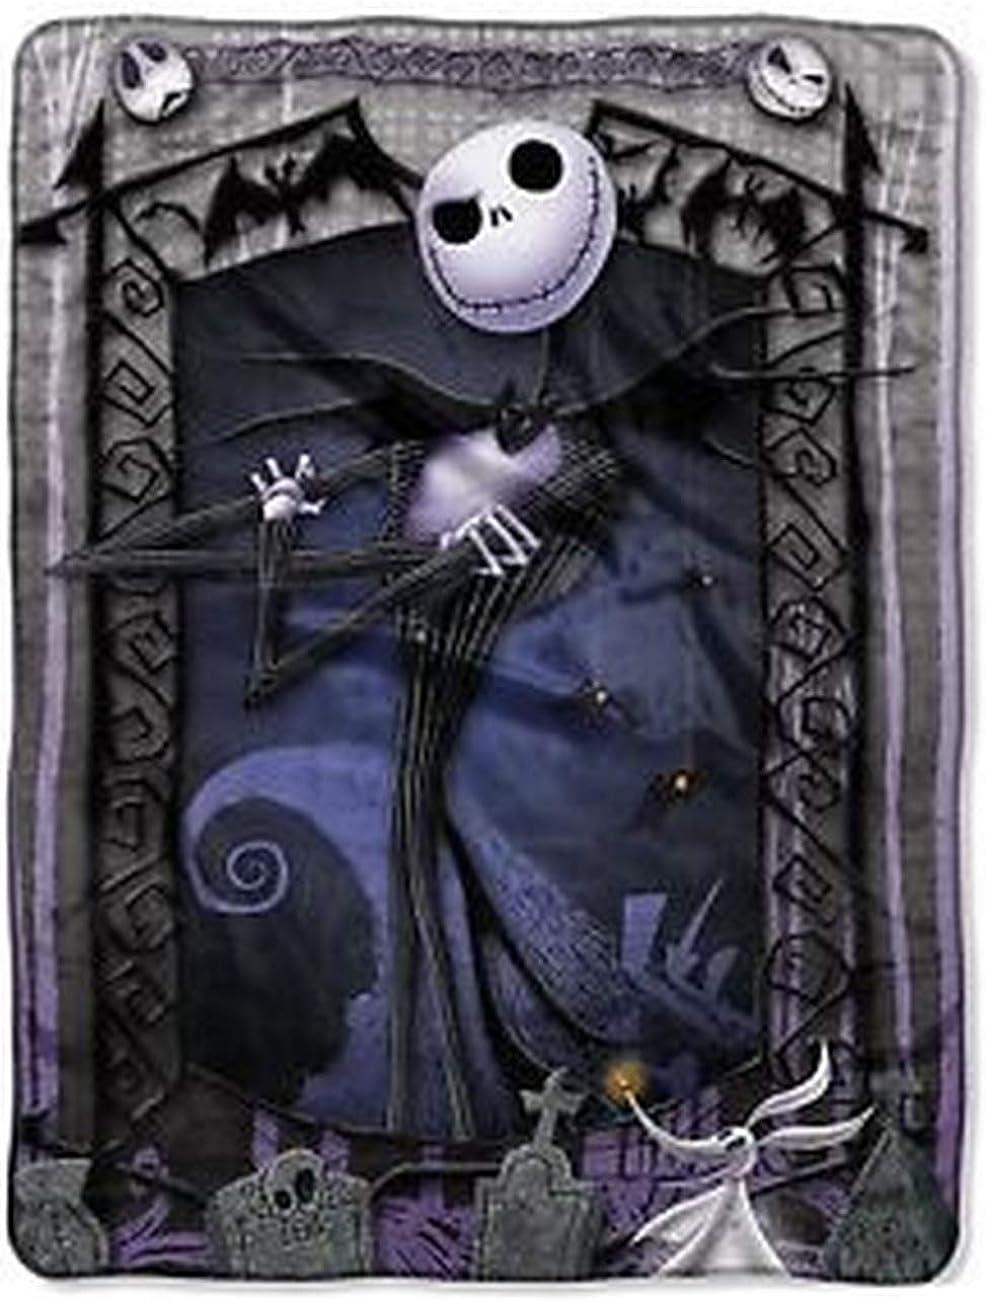 The Nightmare Before Christmas Blanket Throw ~ Jack Skellington & Zero by Disney